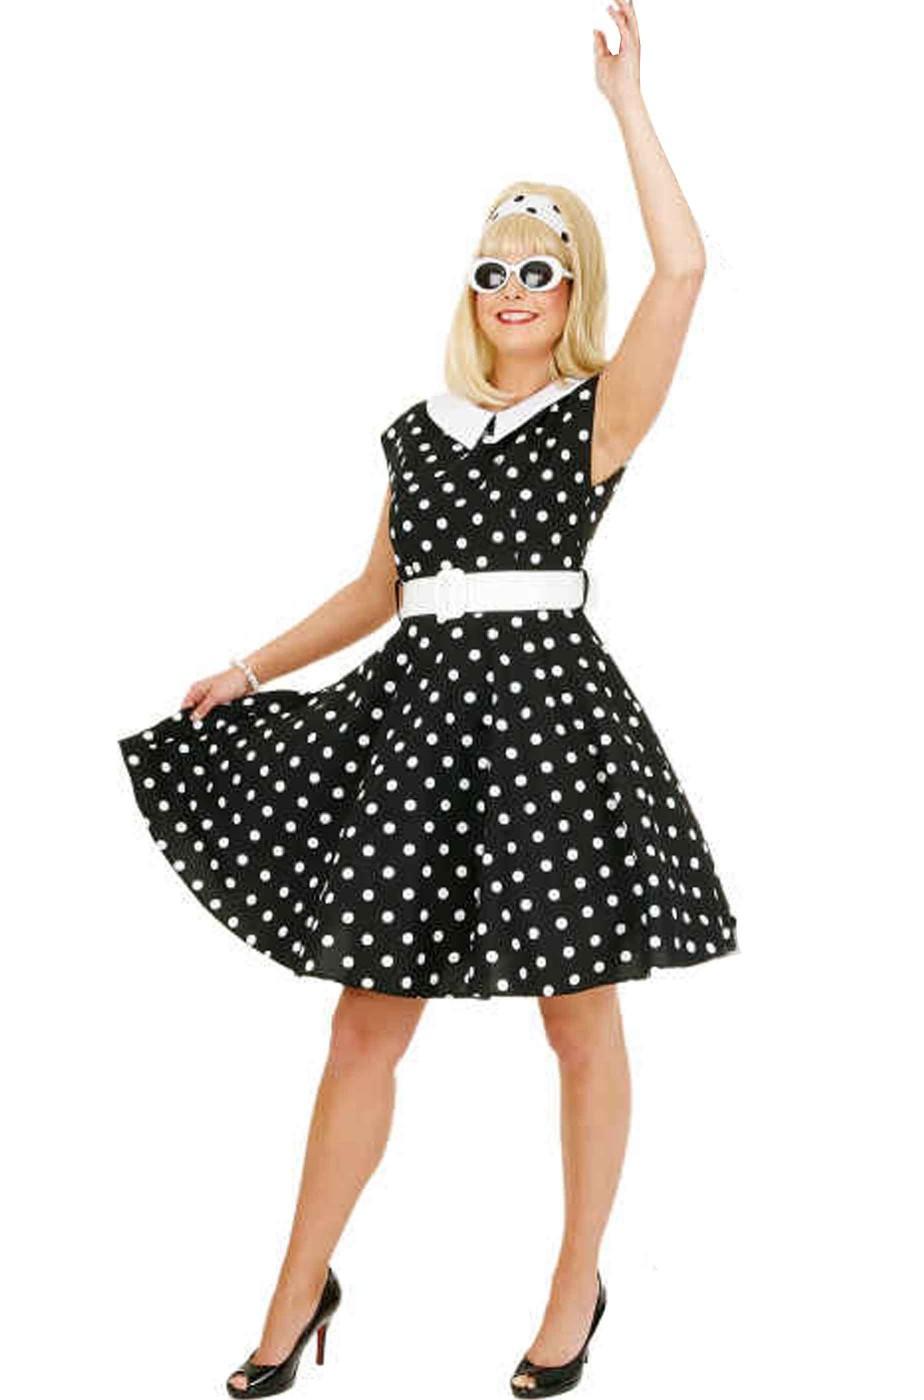 Costume donna anni 50. Qualita' teatrale